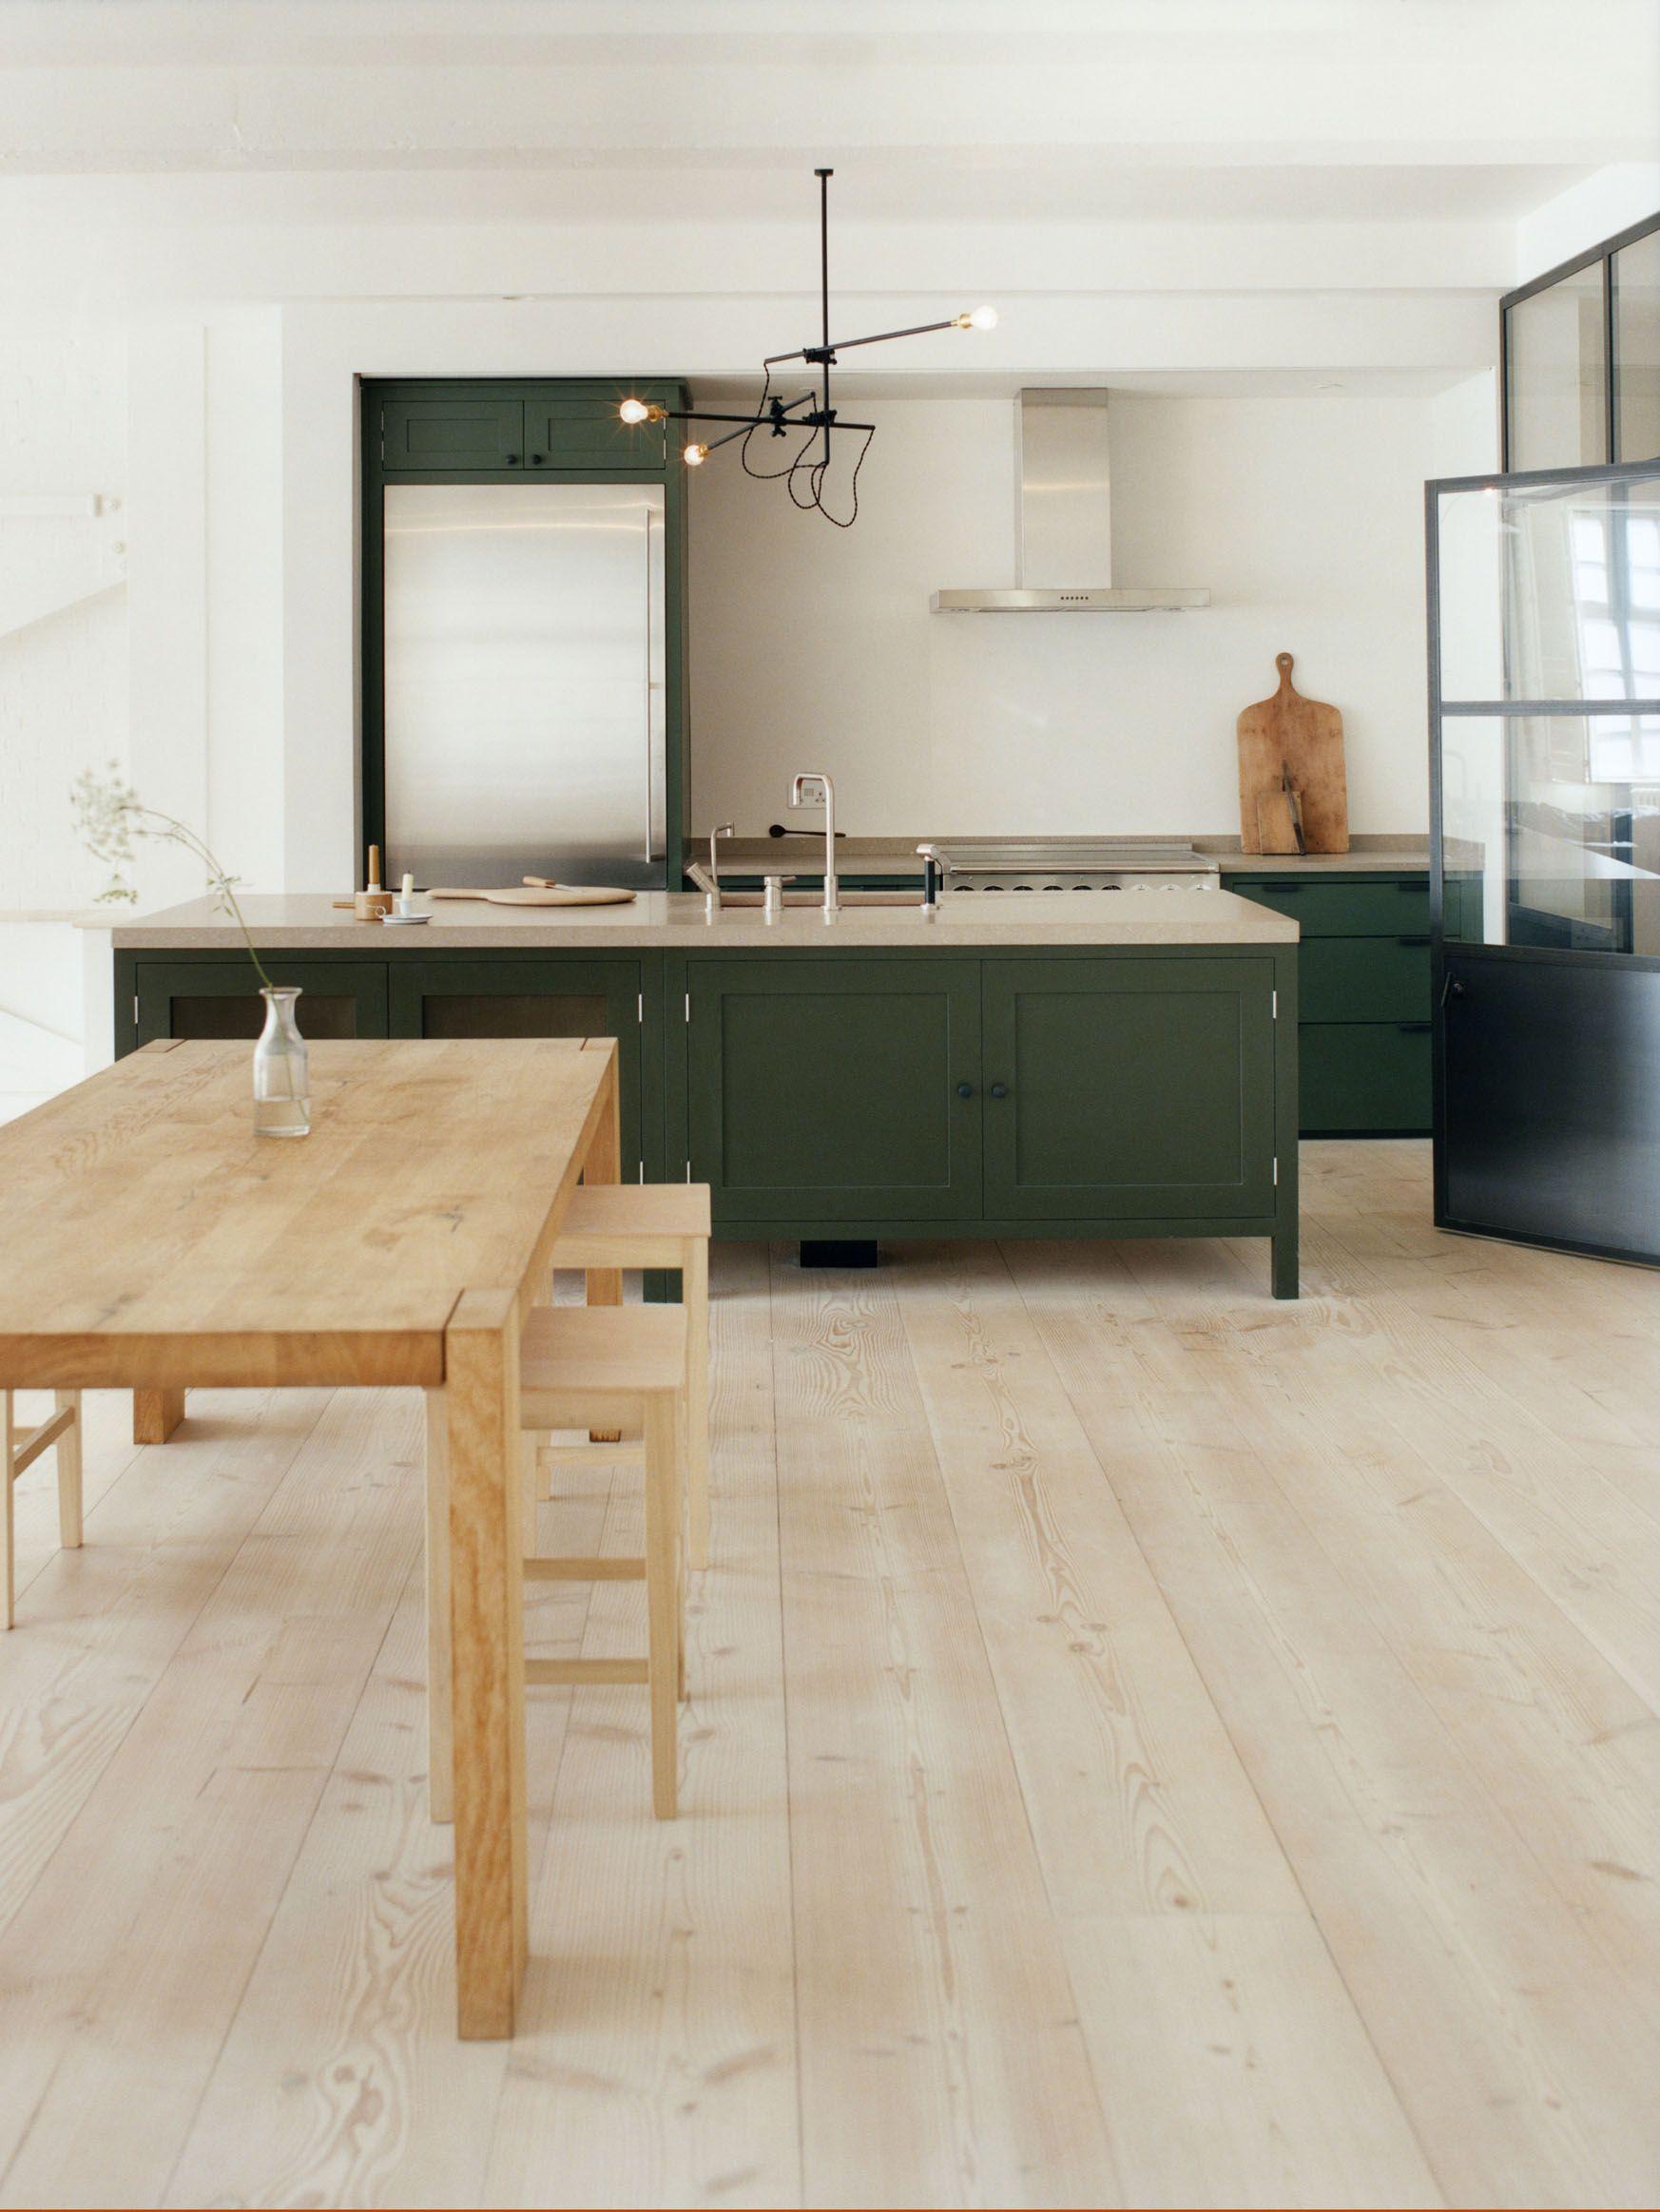 The Osea Kitchen By Plain English Www Plainenglishdesign Co Uk Kitchen Design Trends Green Kitchen Cabinets Kitchen Design